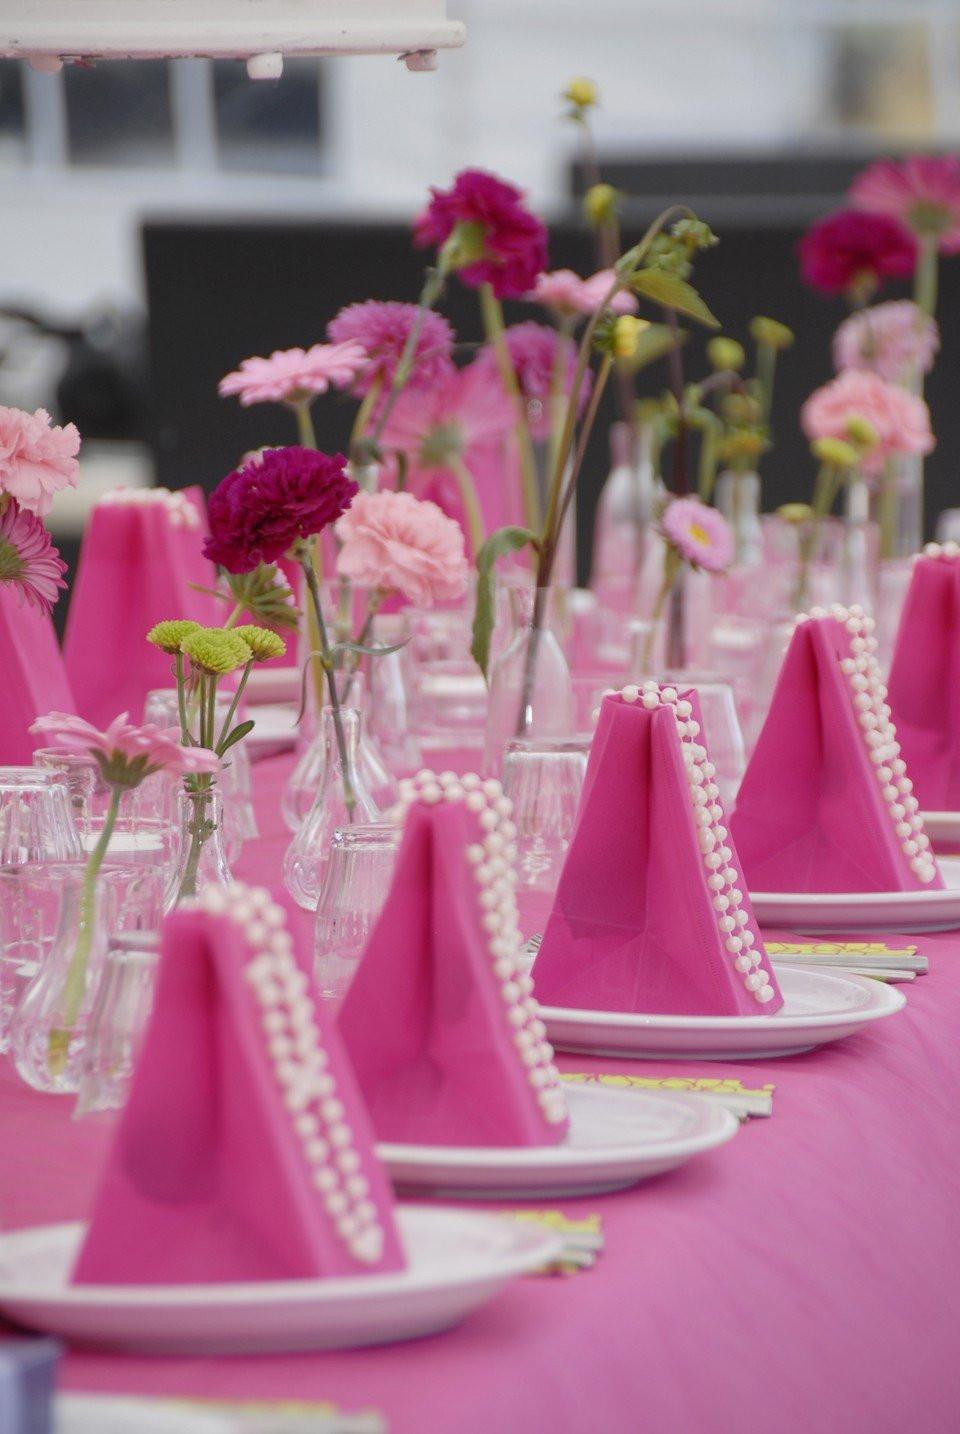 Hippe Fel Roze Tafeldecoratie Theperfectwedding Nl